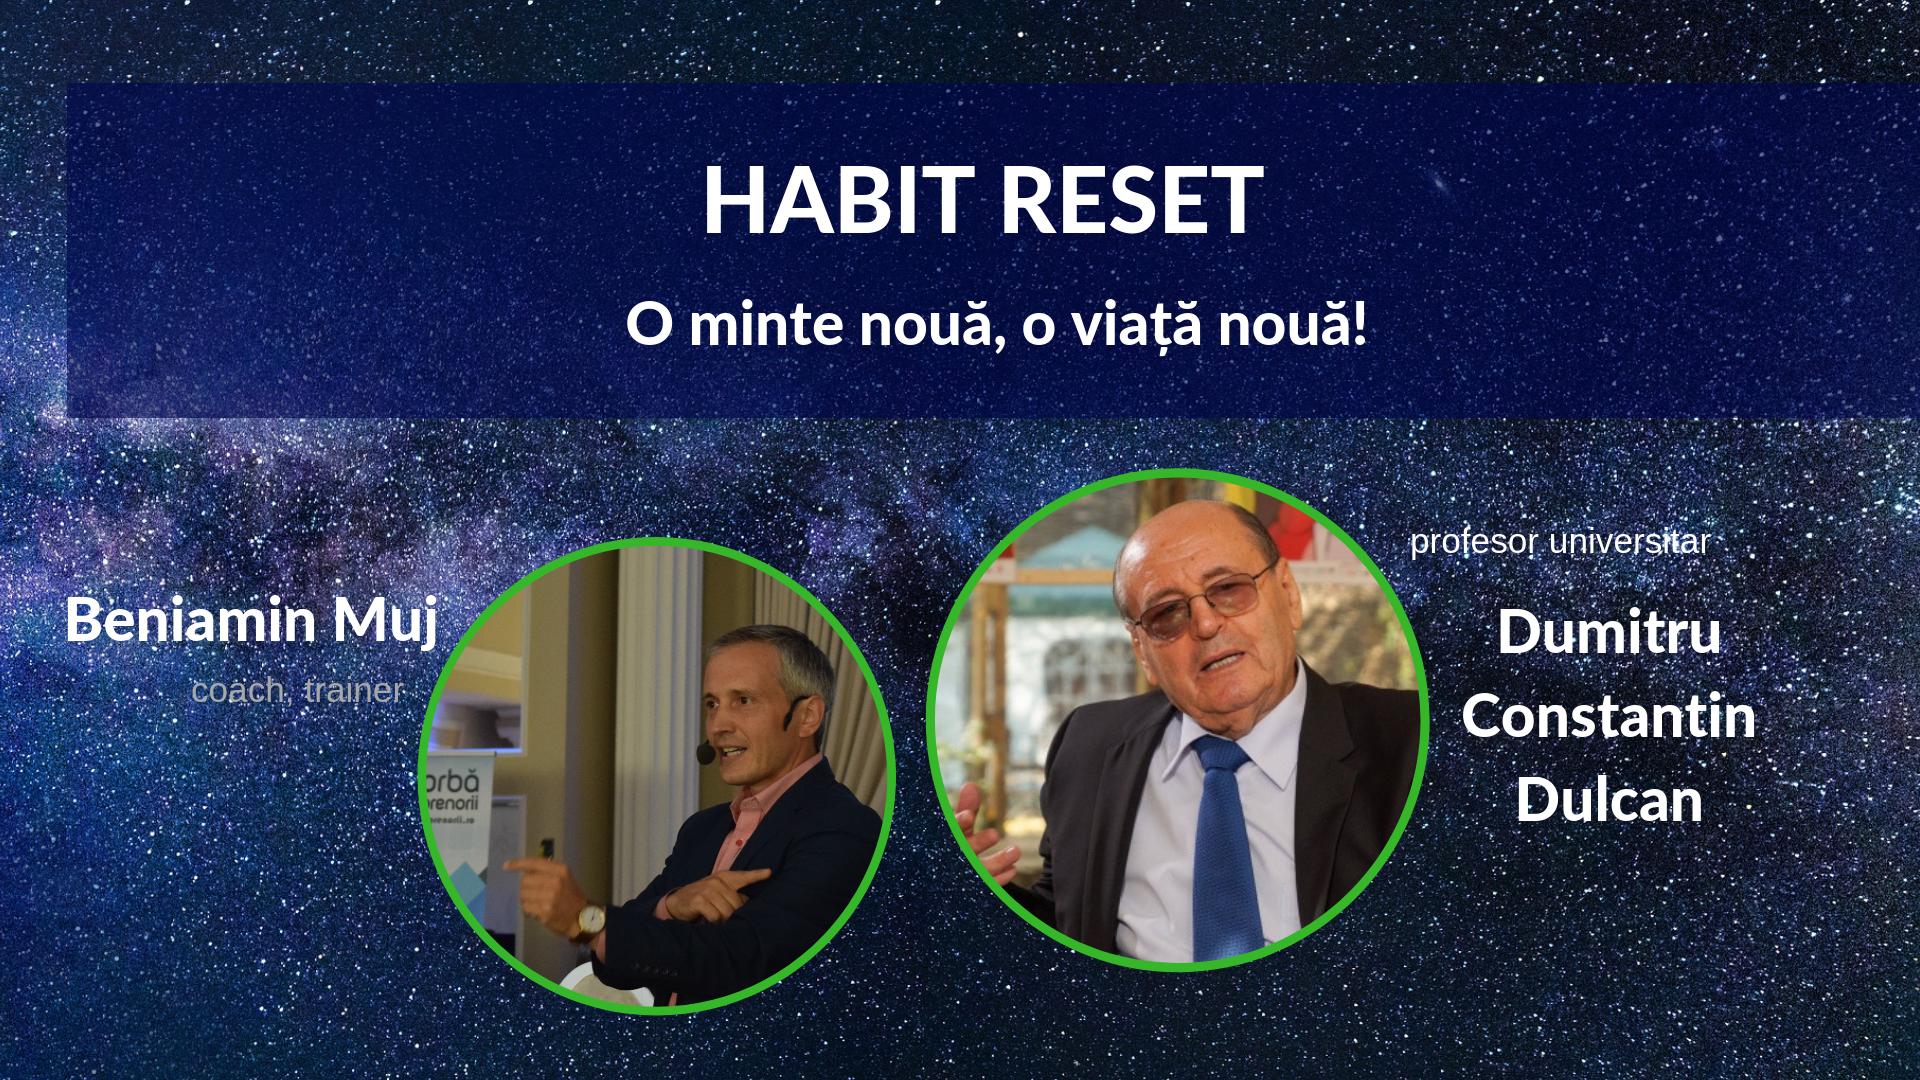 Habit Reset 2019